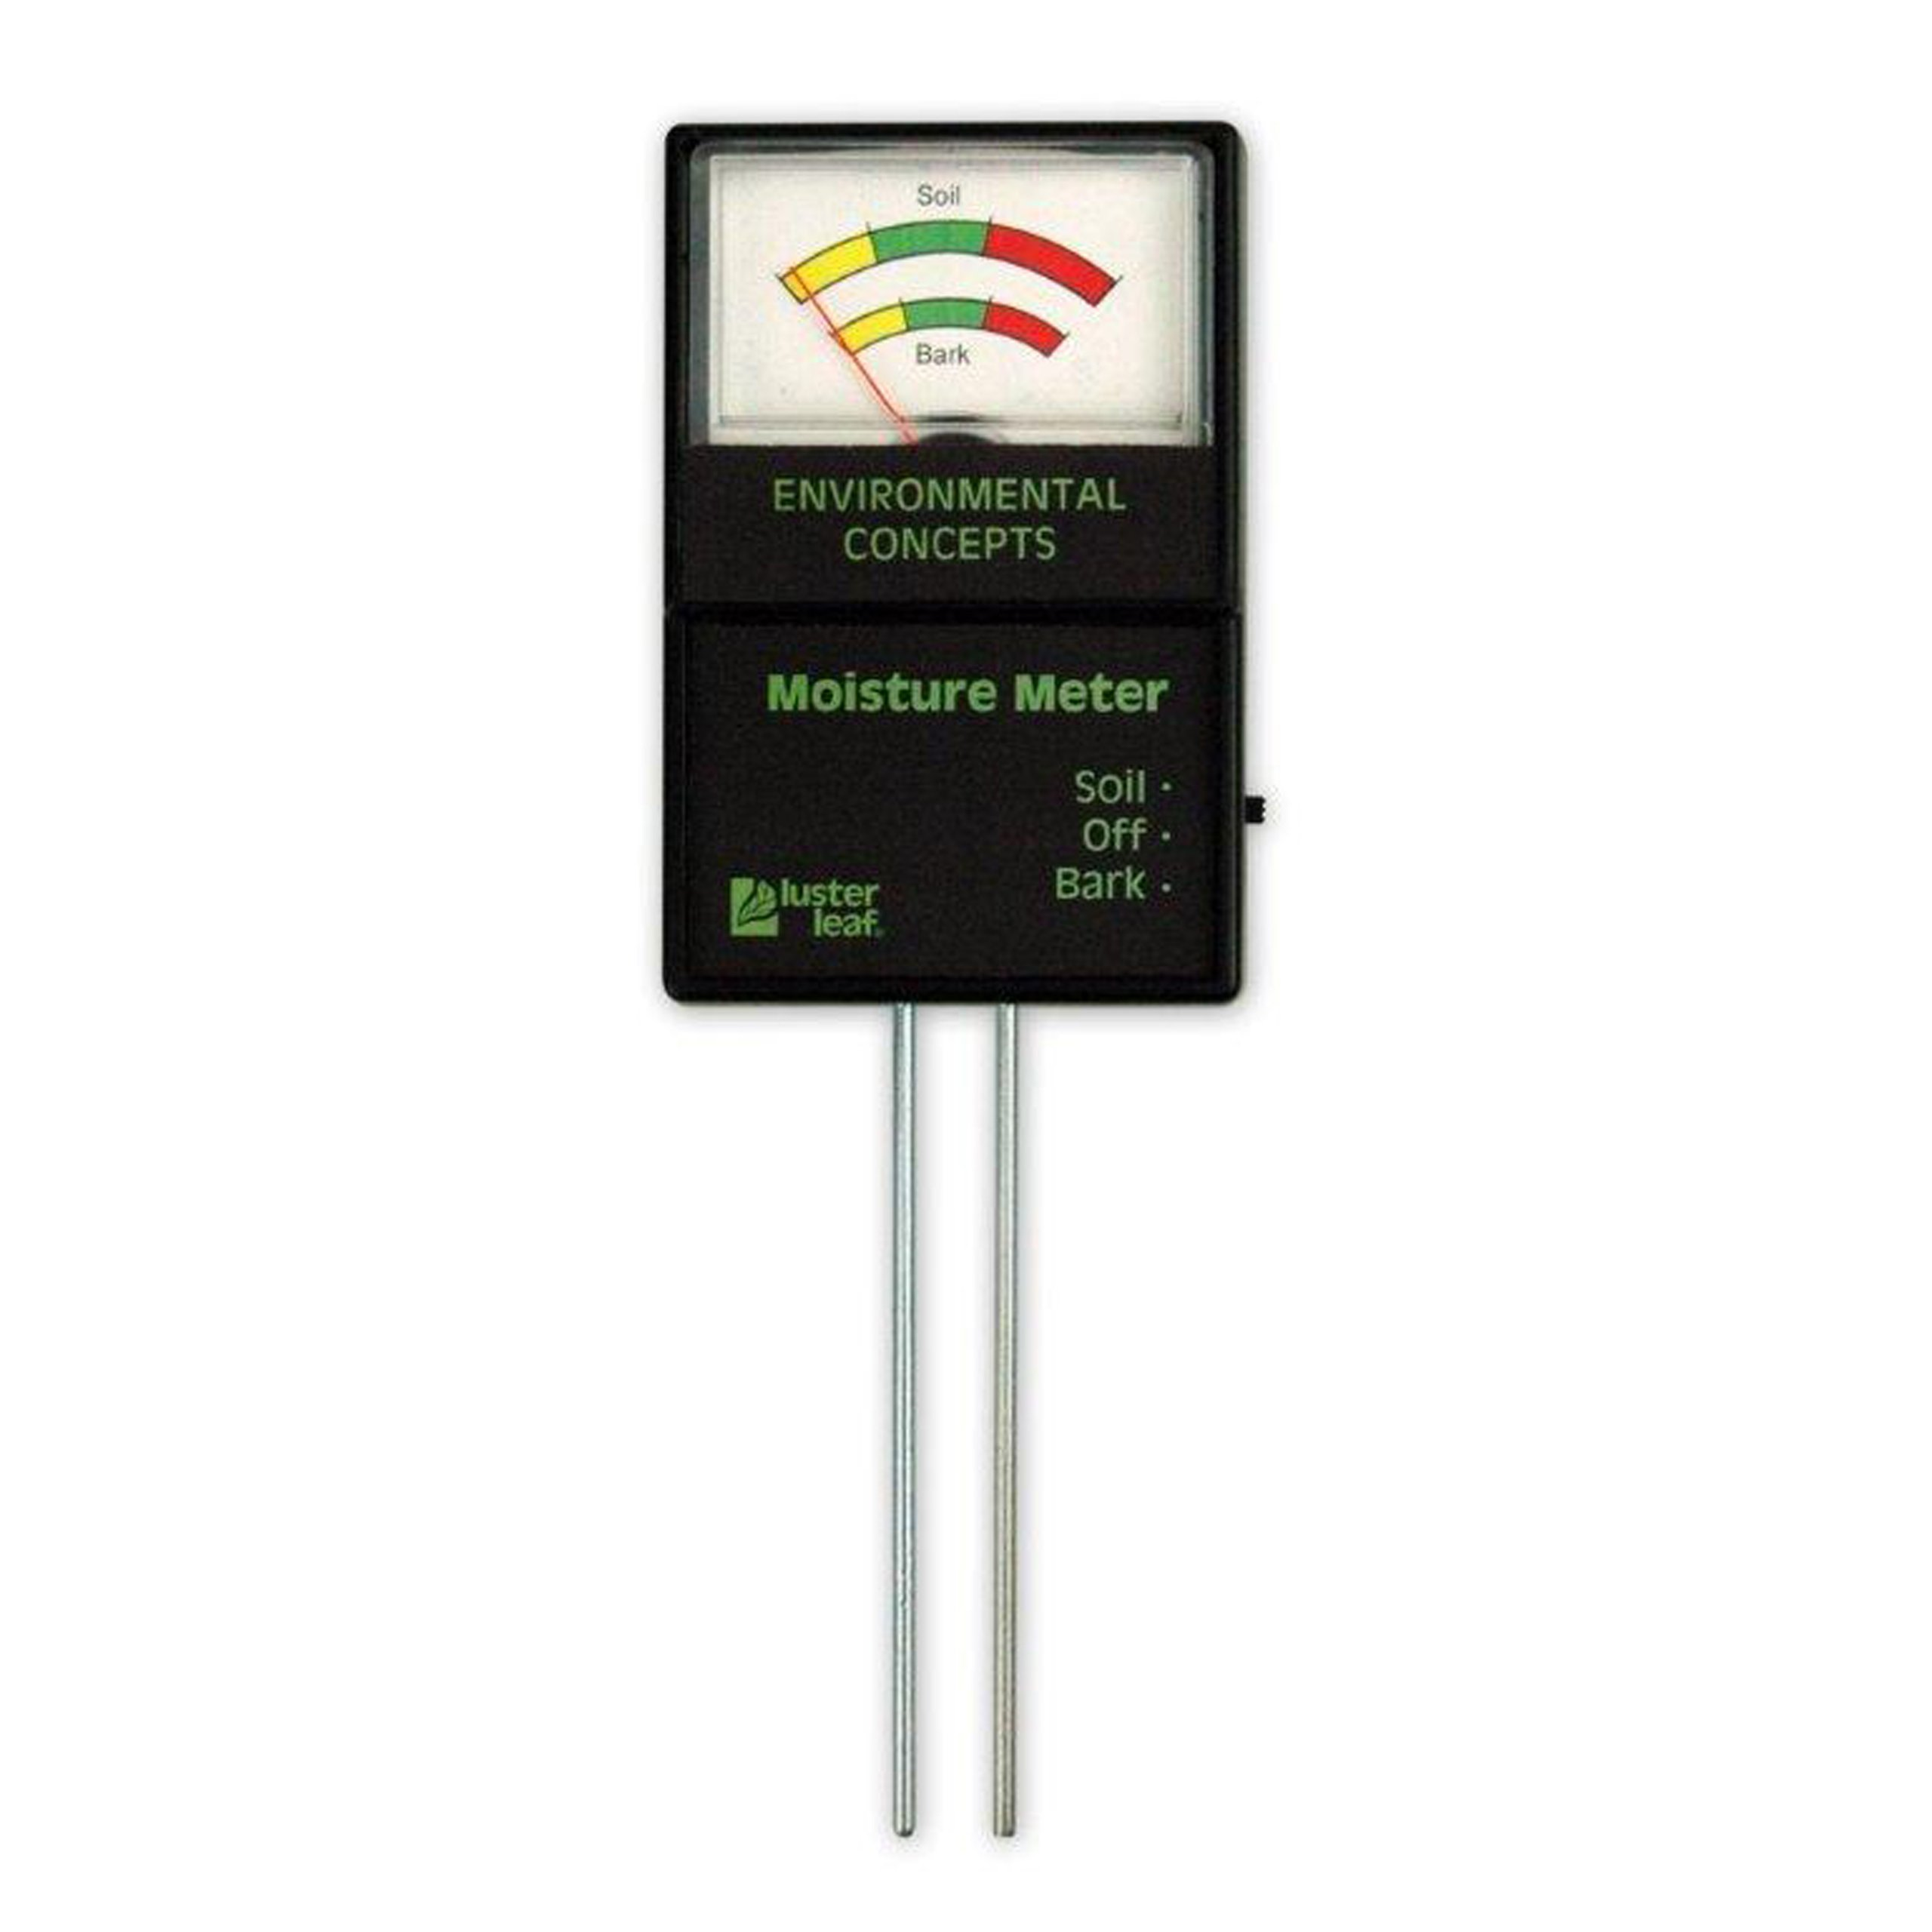 Environmental Concepts SBM12 Soil and Bark Moisture Meter